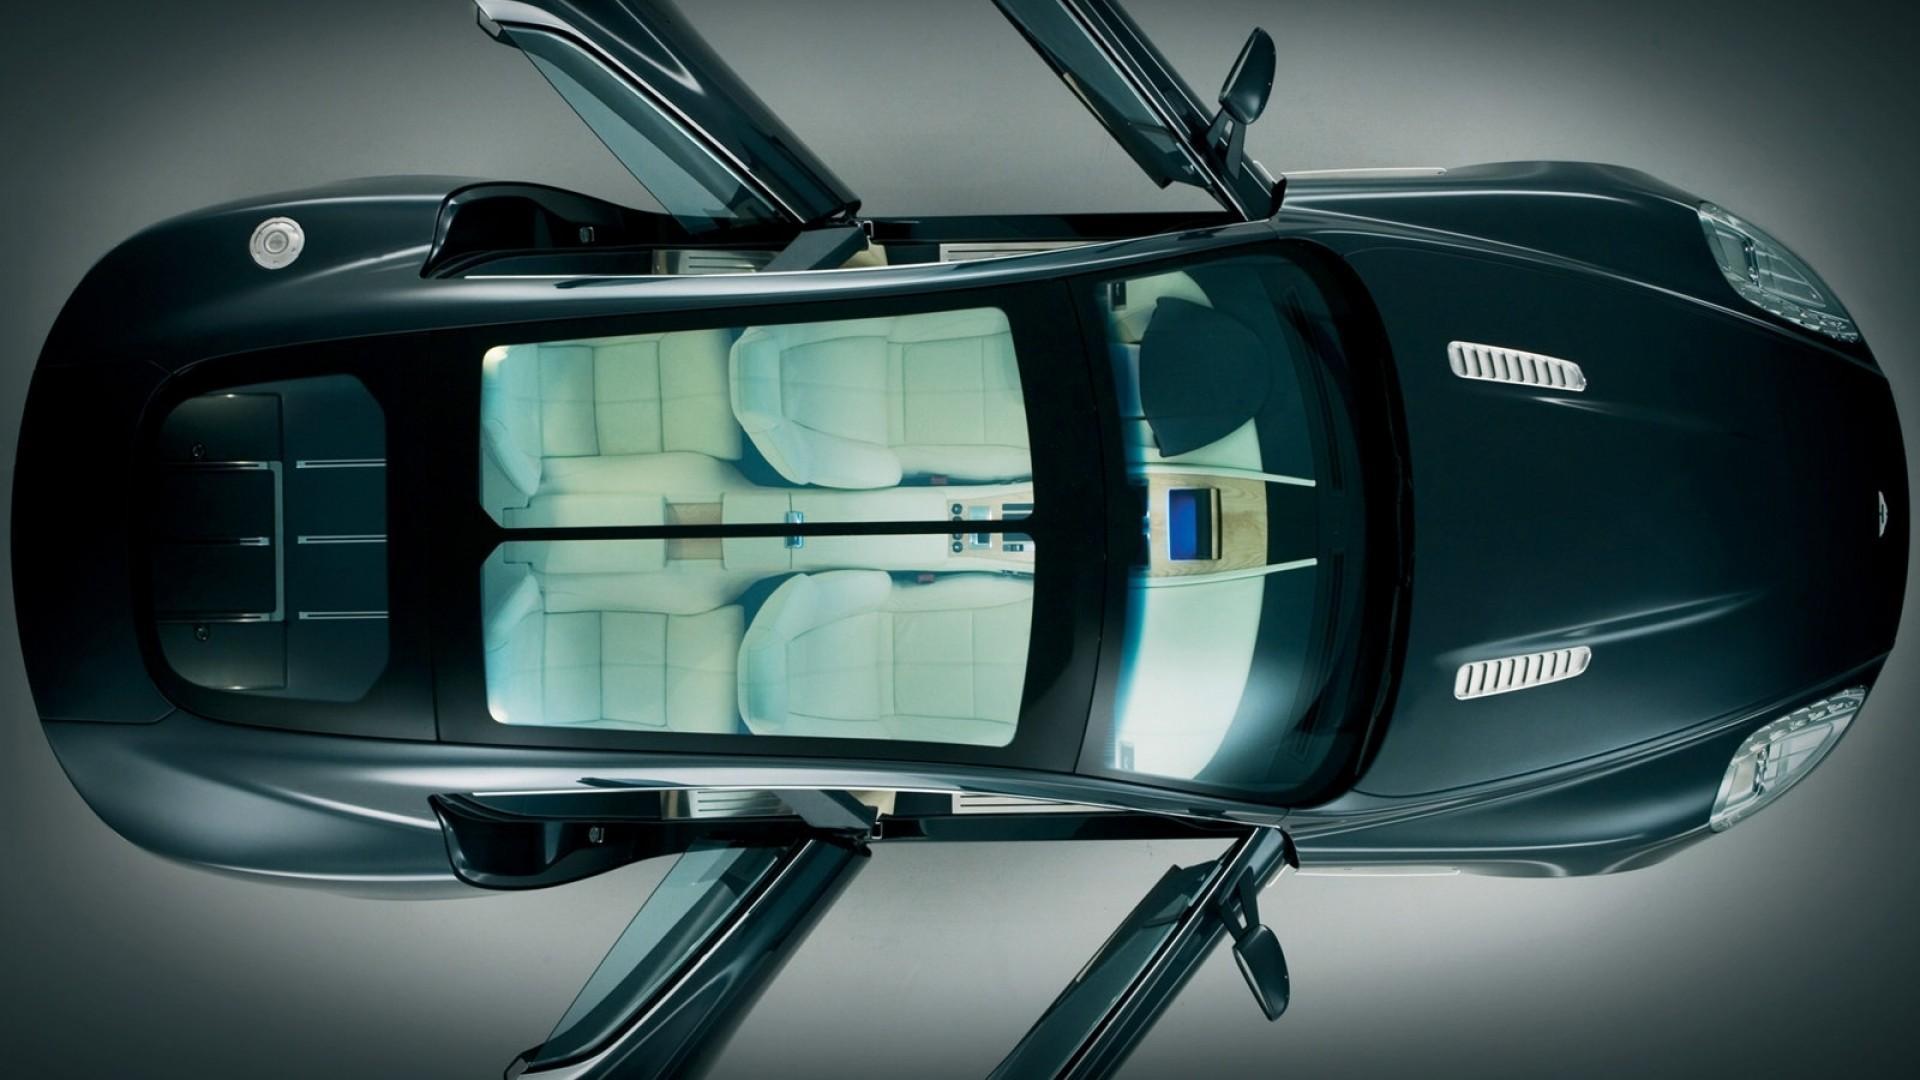 Aston Martin Rapide 2006  Hitam  Top View  Mobil Ko  HD Wallpaper